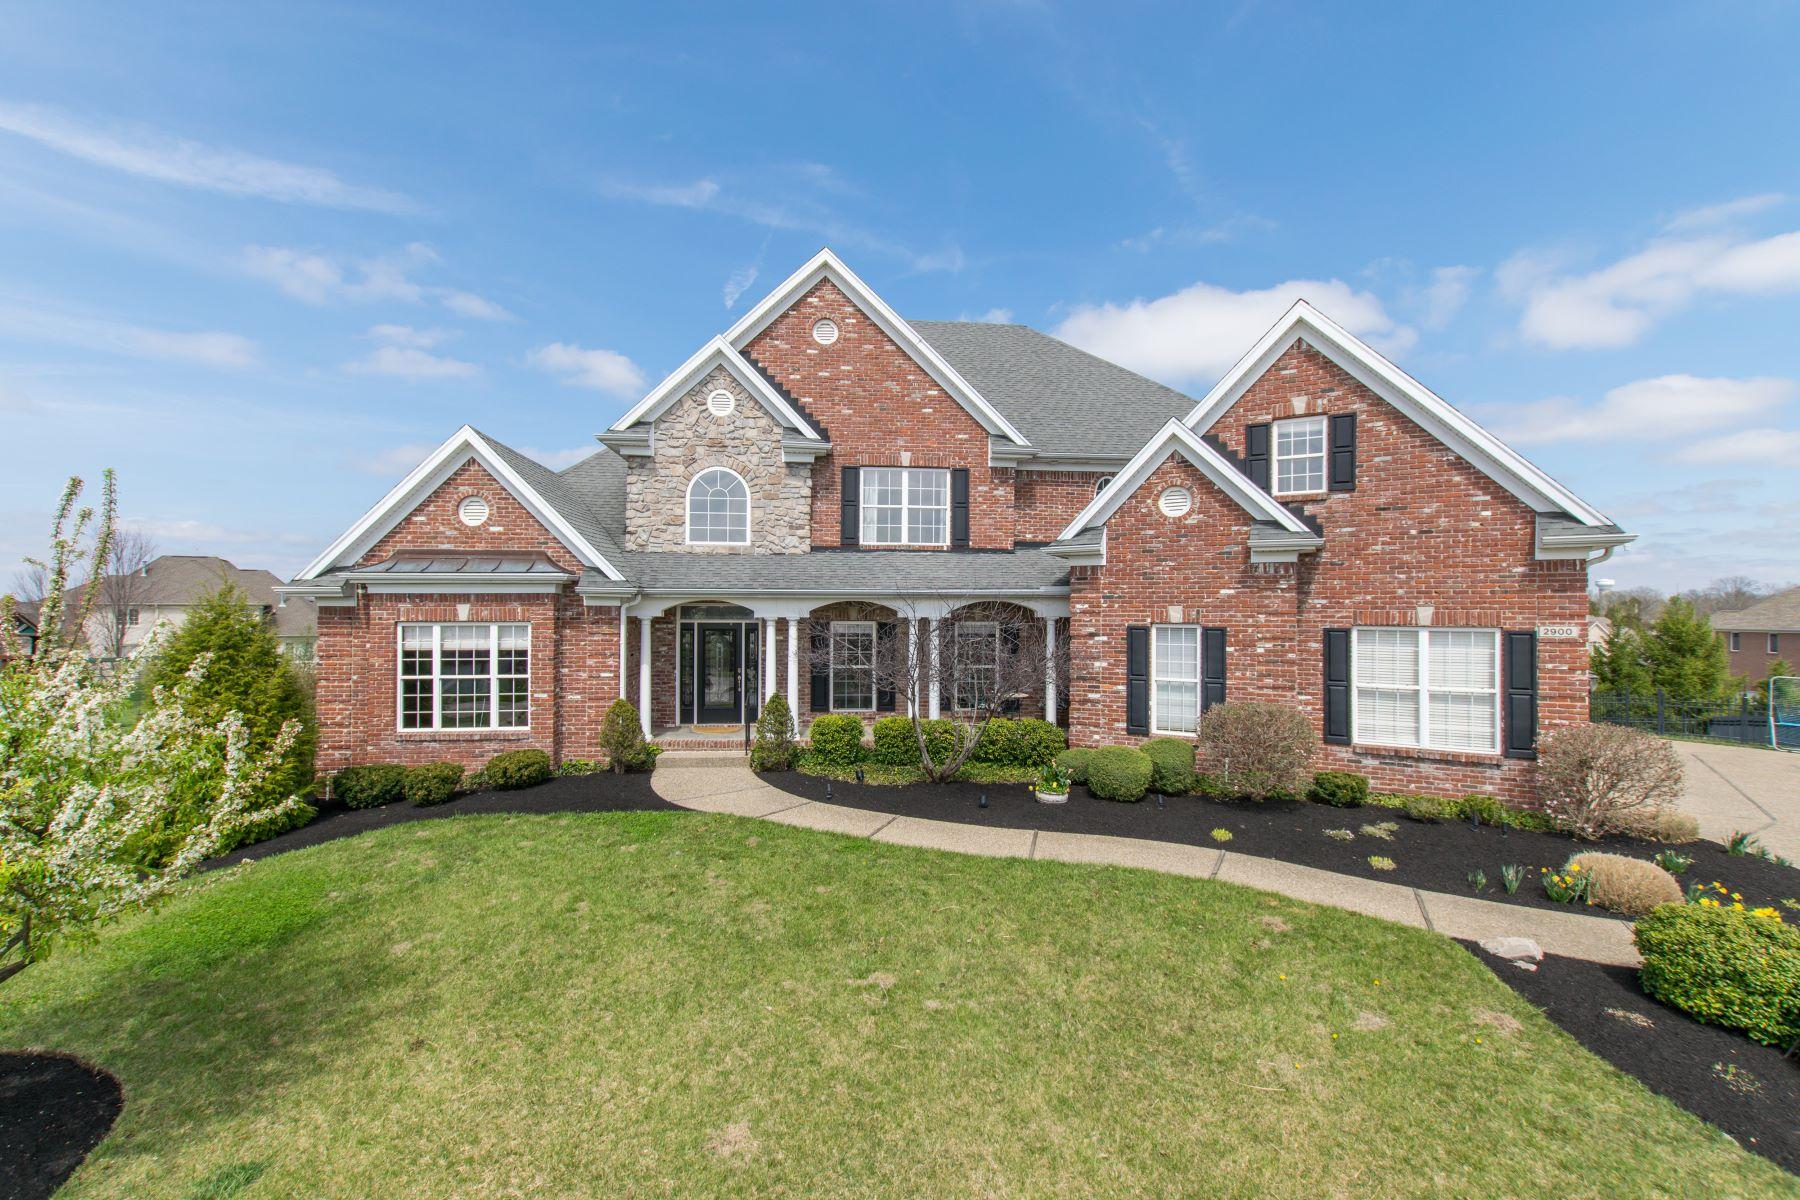 Vivienda unifamiliar por un Venta en 2900 Circle Crest Court Prospect, Kentucky, 40059 Estados Unidos